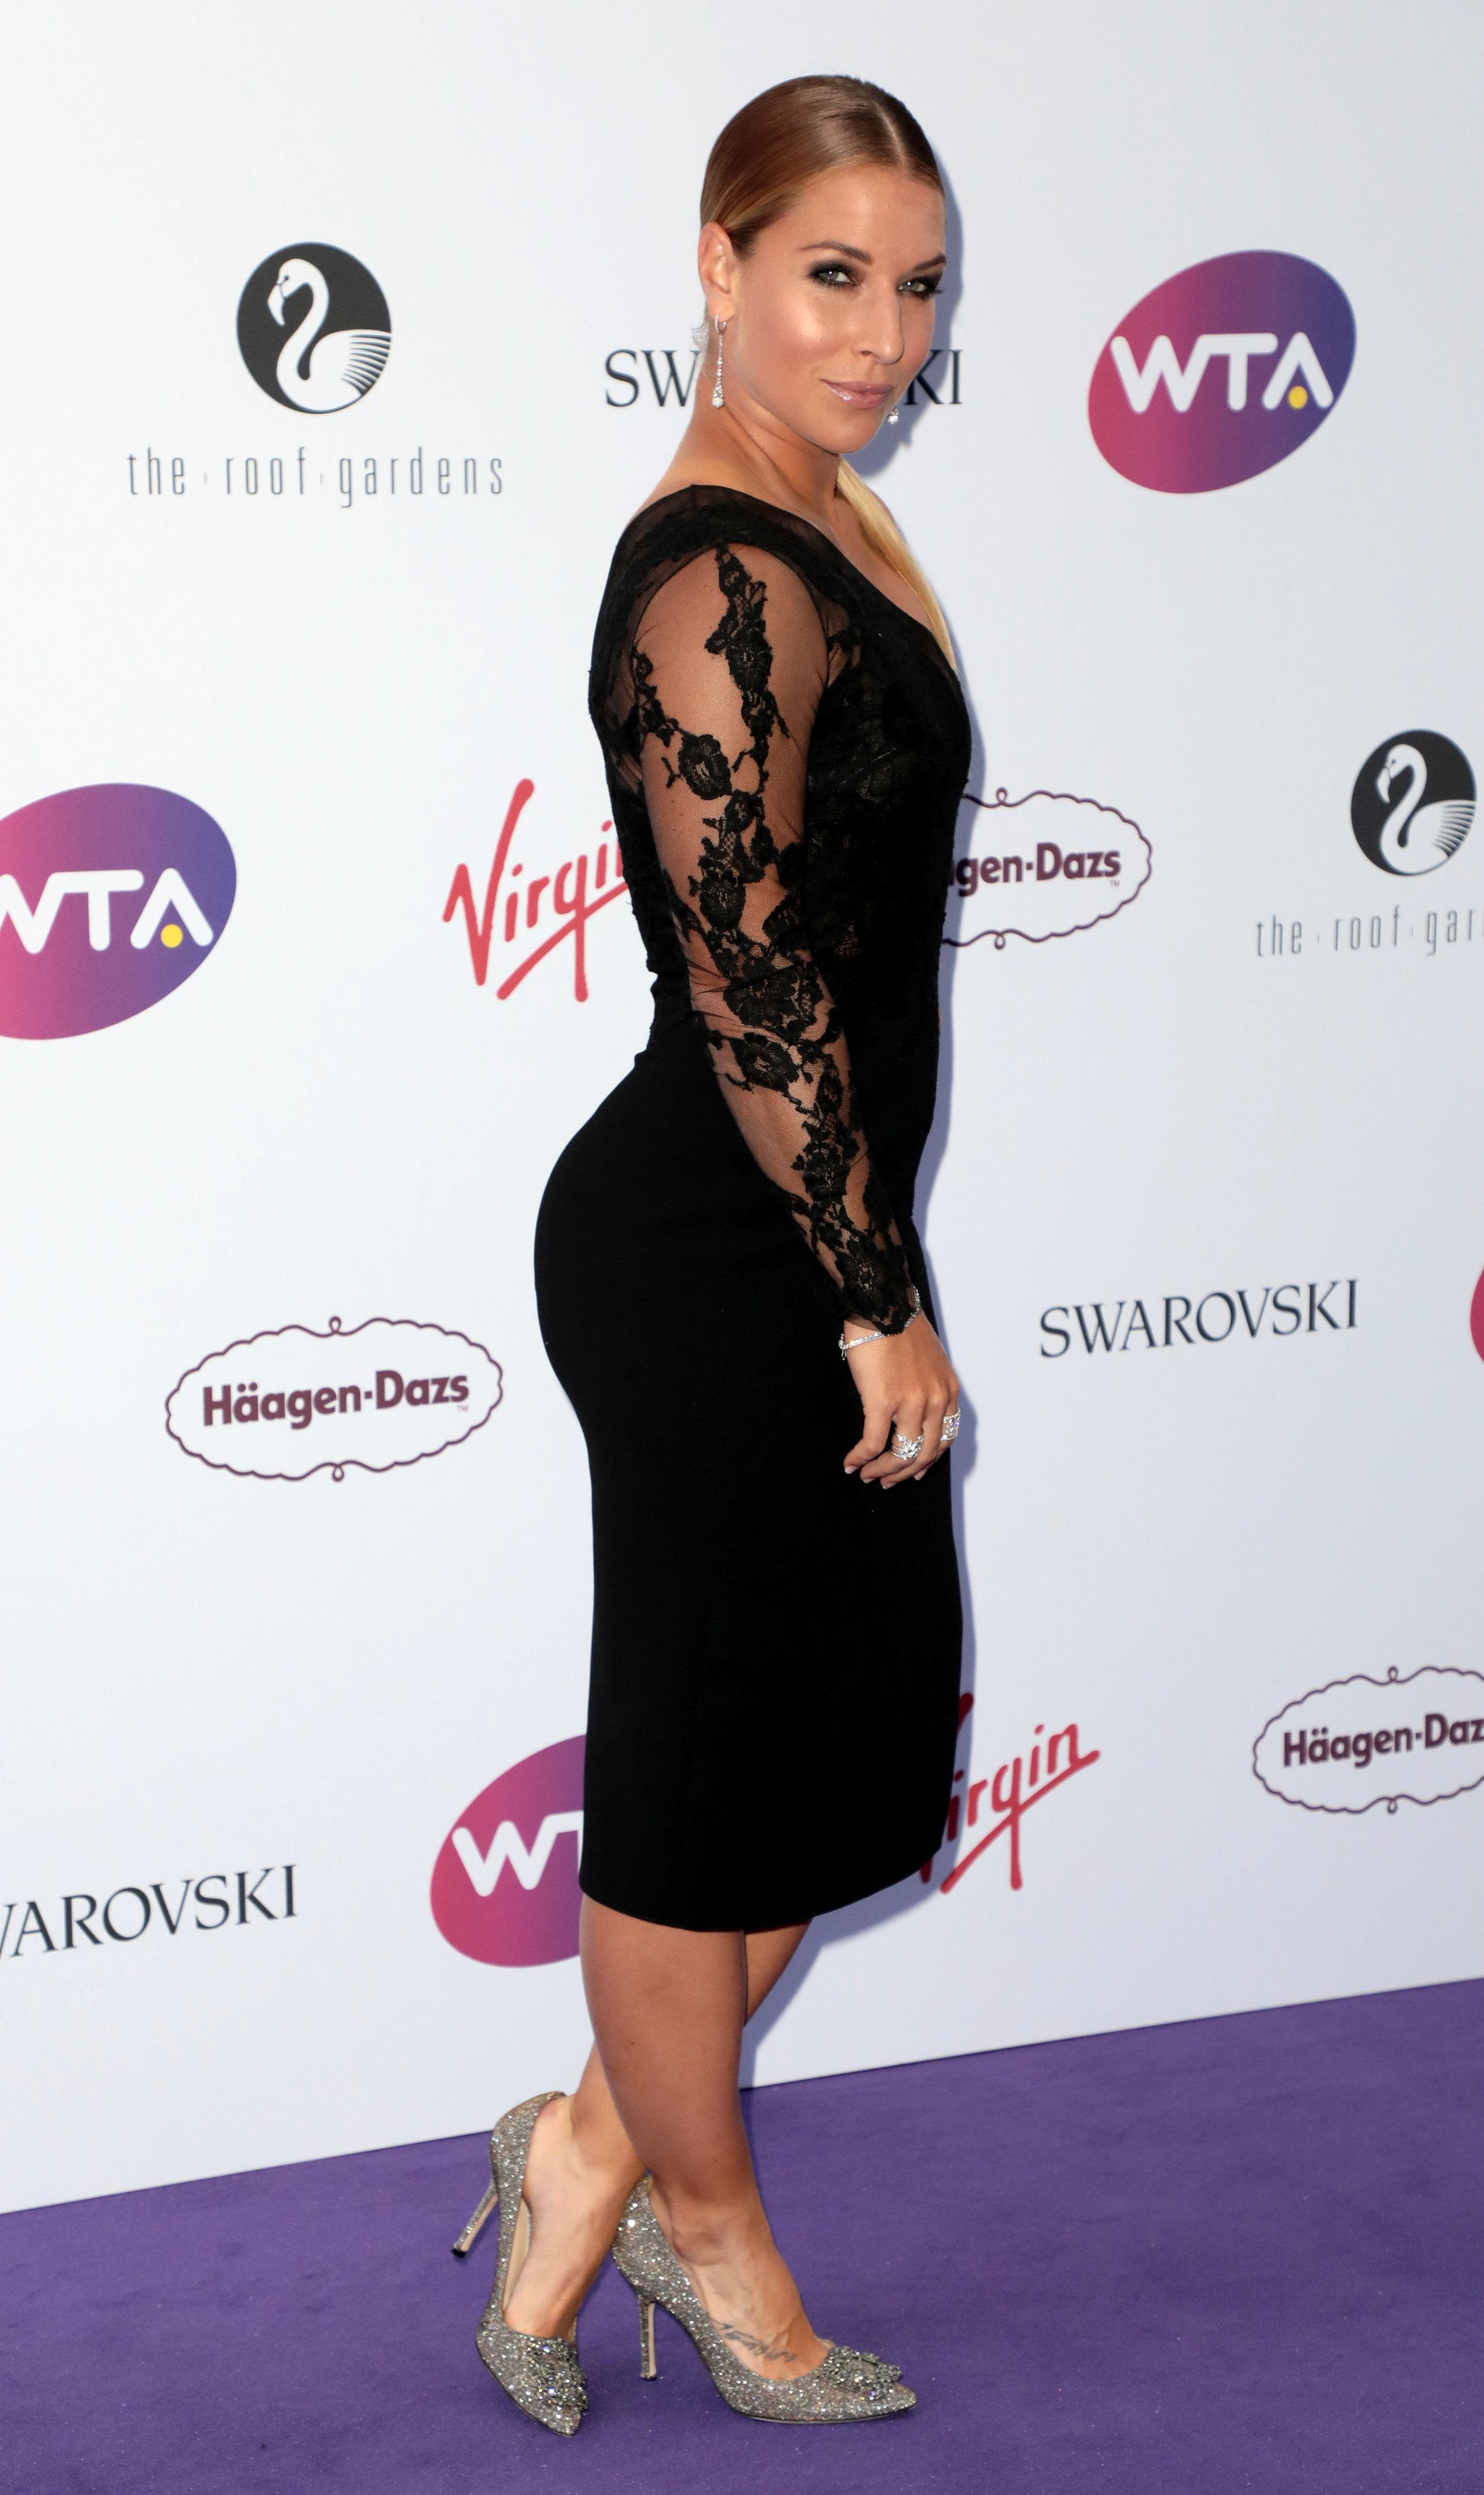 PHT_B5327_WTA_Pre_Wimbledon_Party_13890.JPG